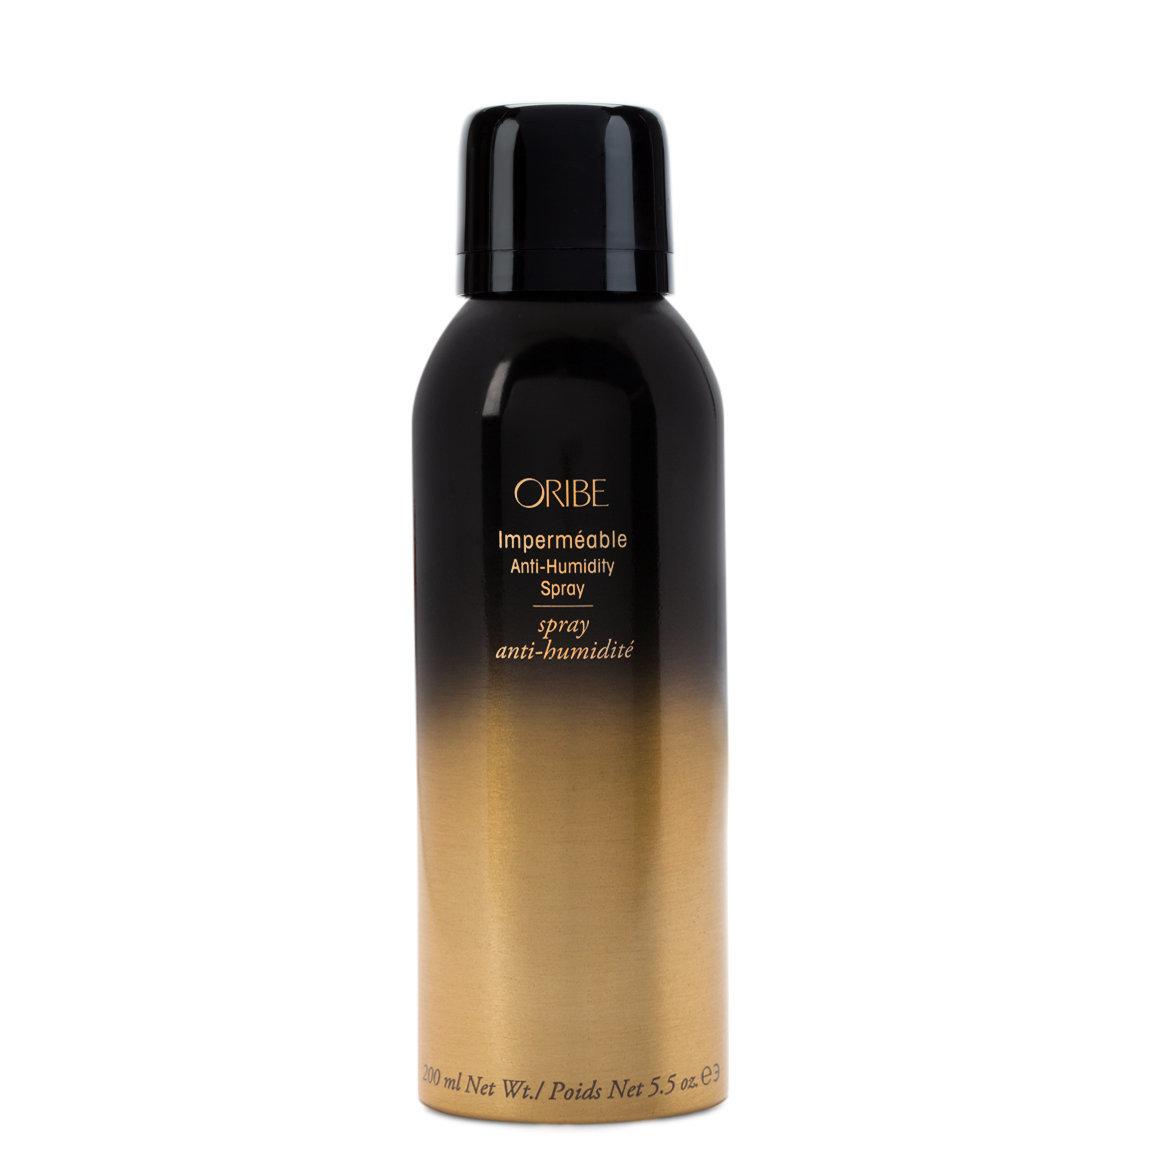 Oribe Imperméable Anti-Humidity Spray 5.5 oz product swatch.